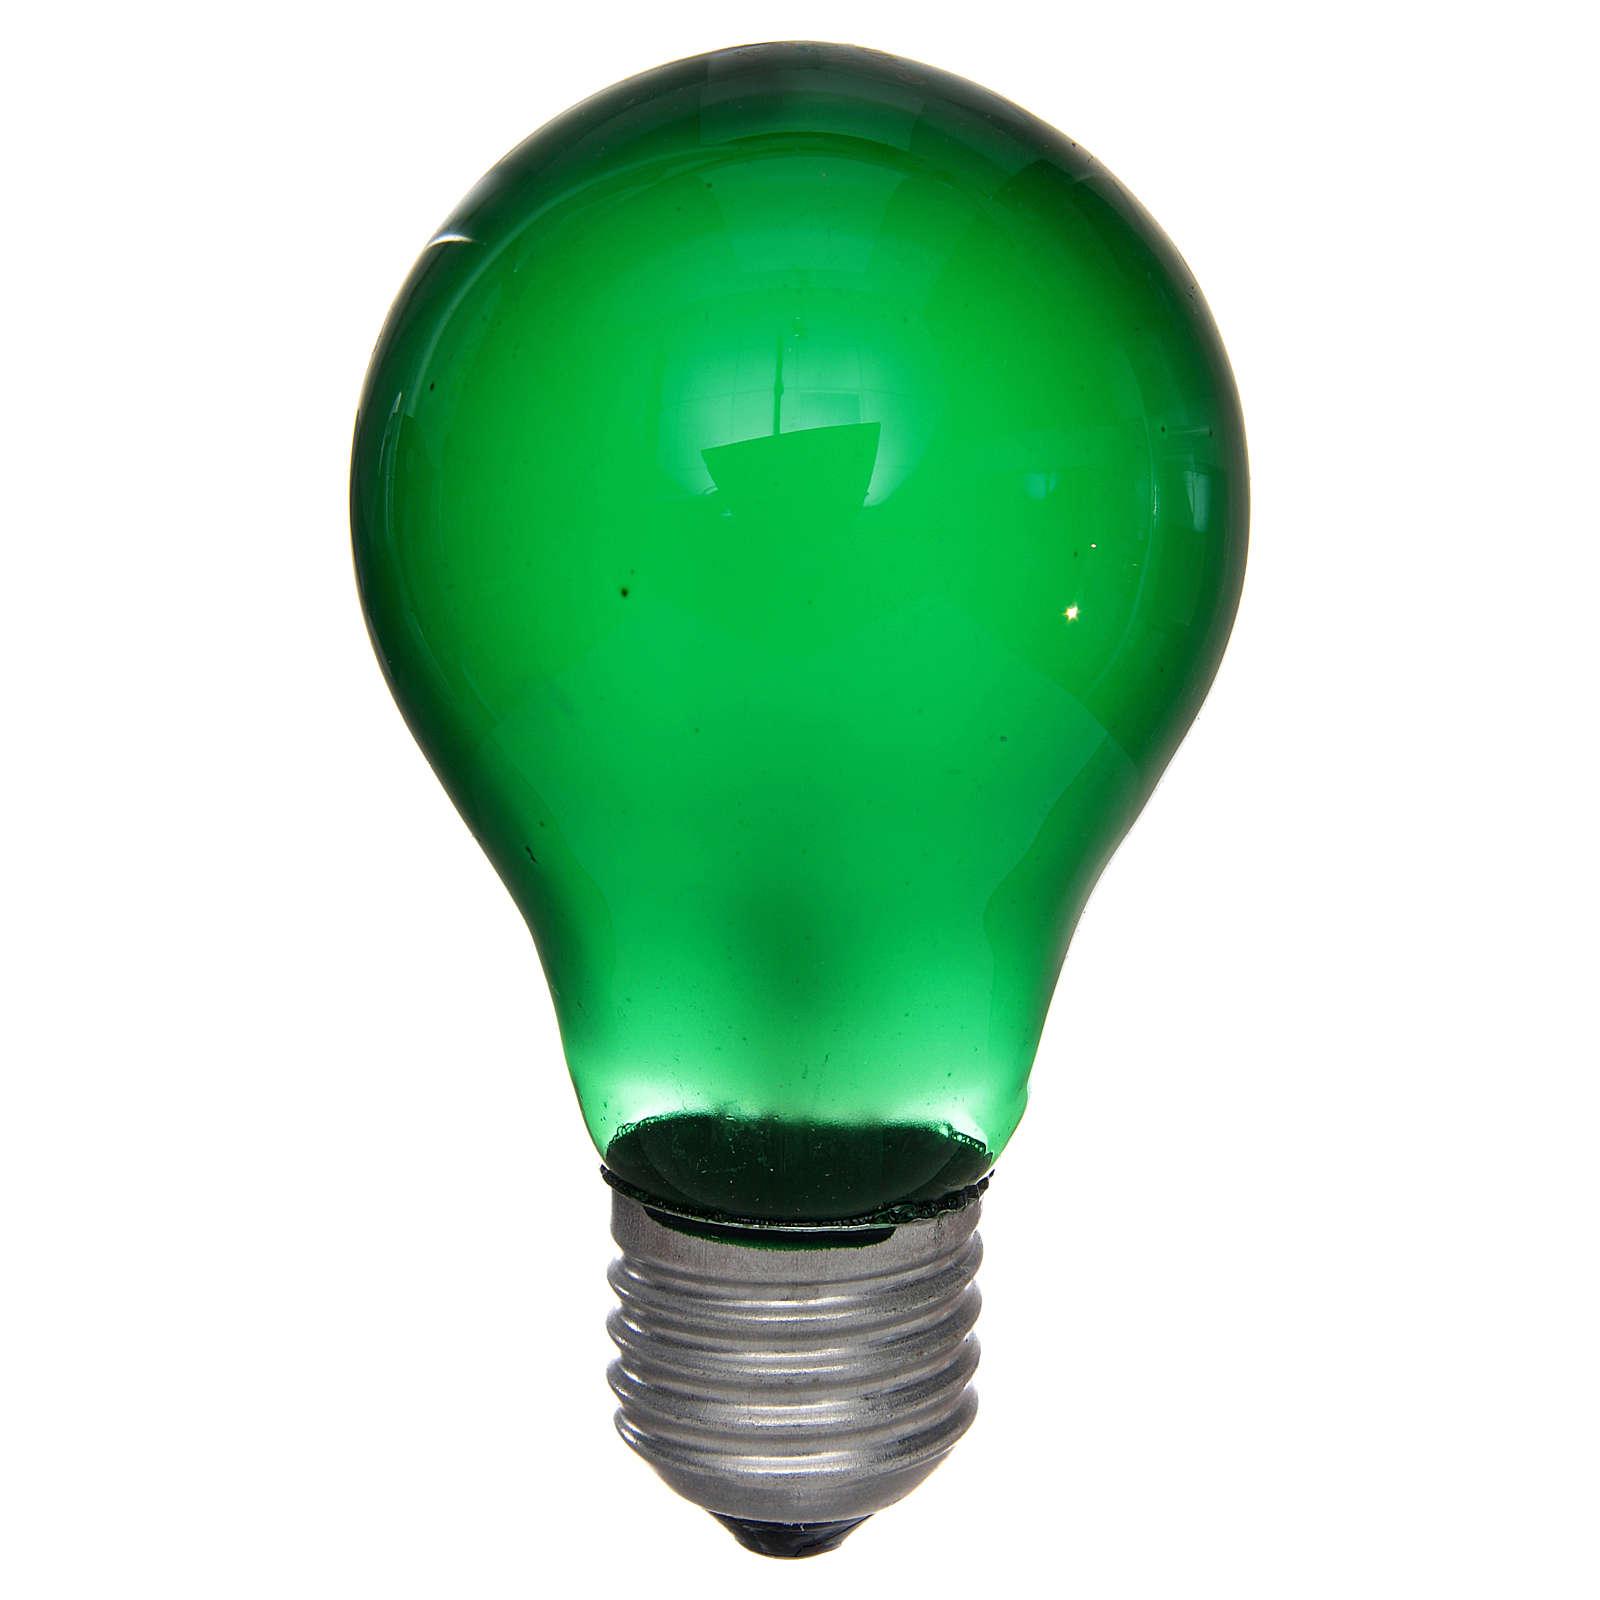 Lampada 40W verde E27 per illuminazione presepi 4